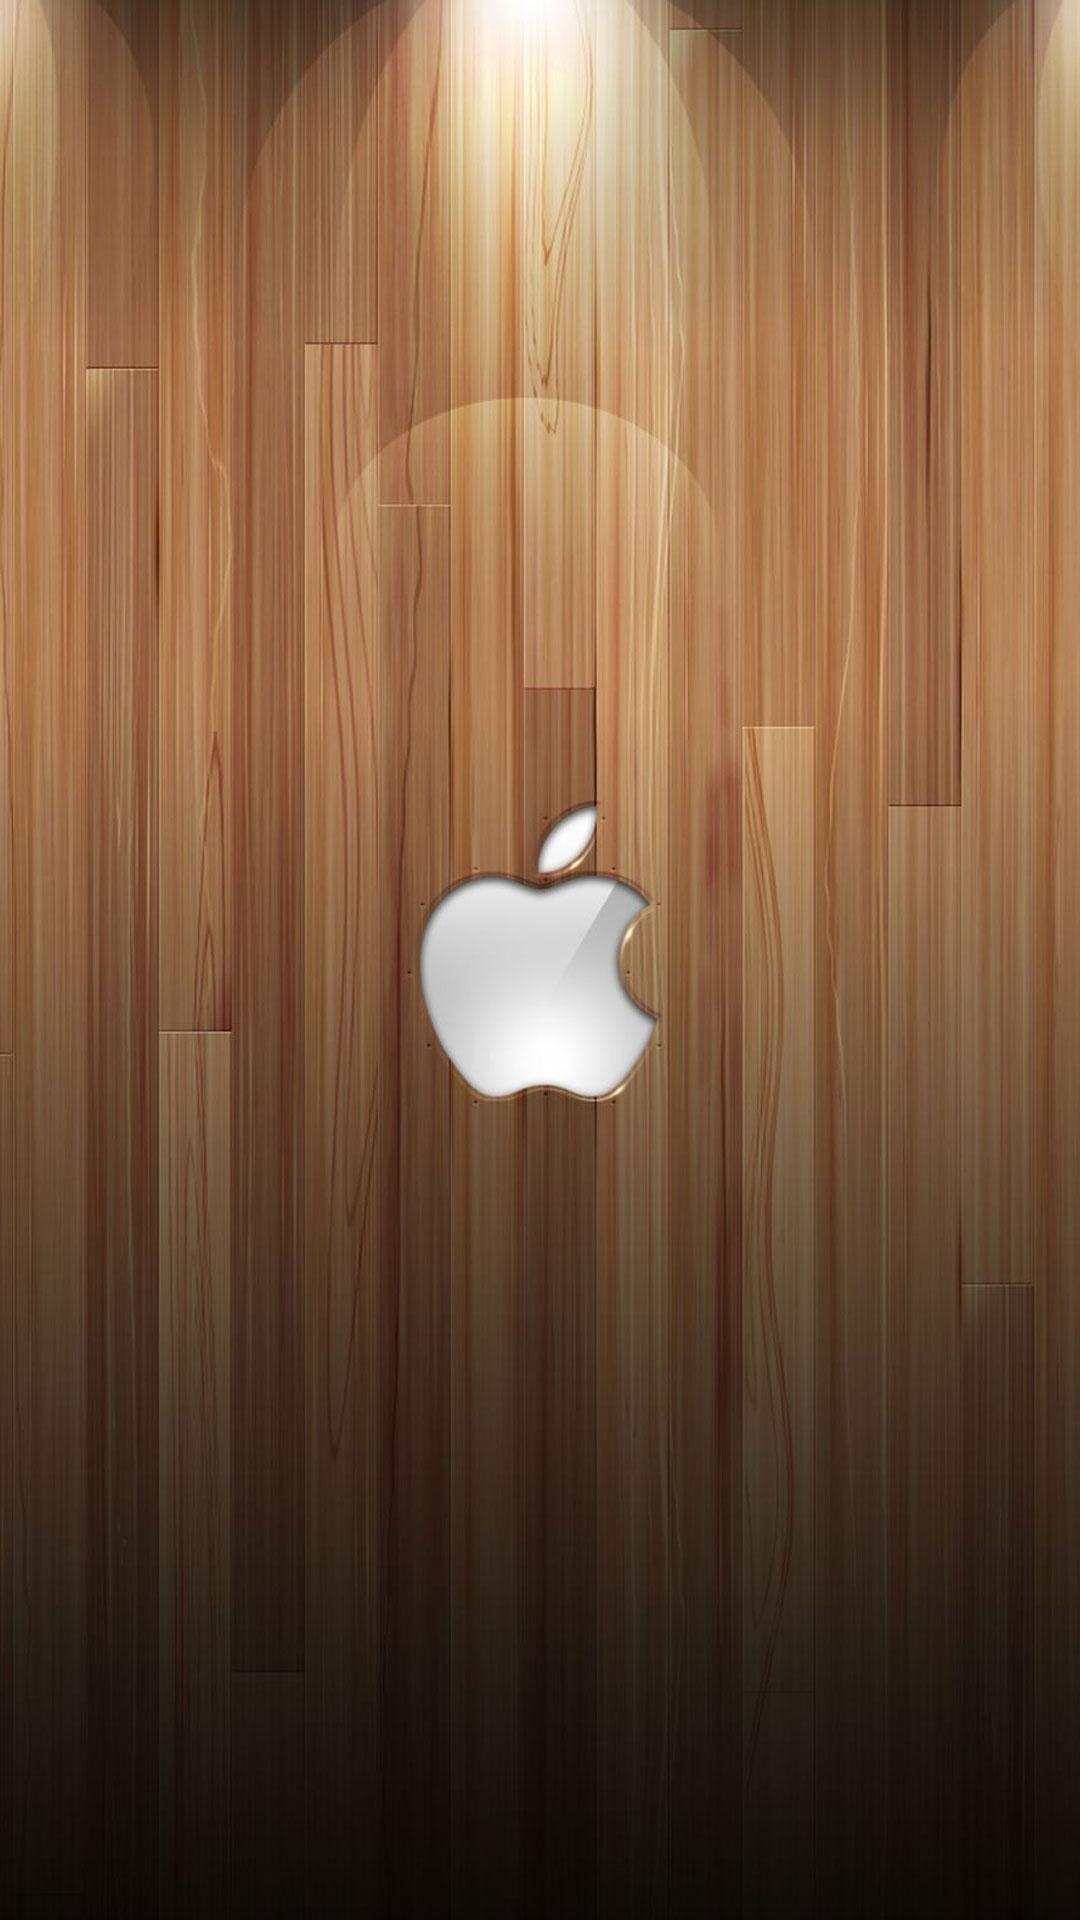 Apple iphone 6 original wallpaper download